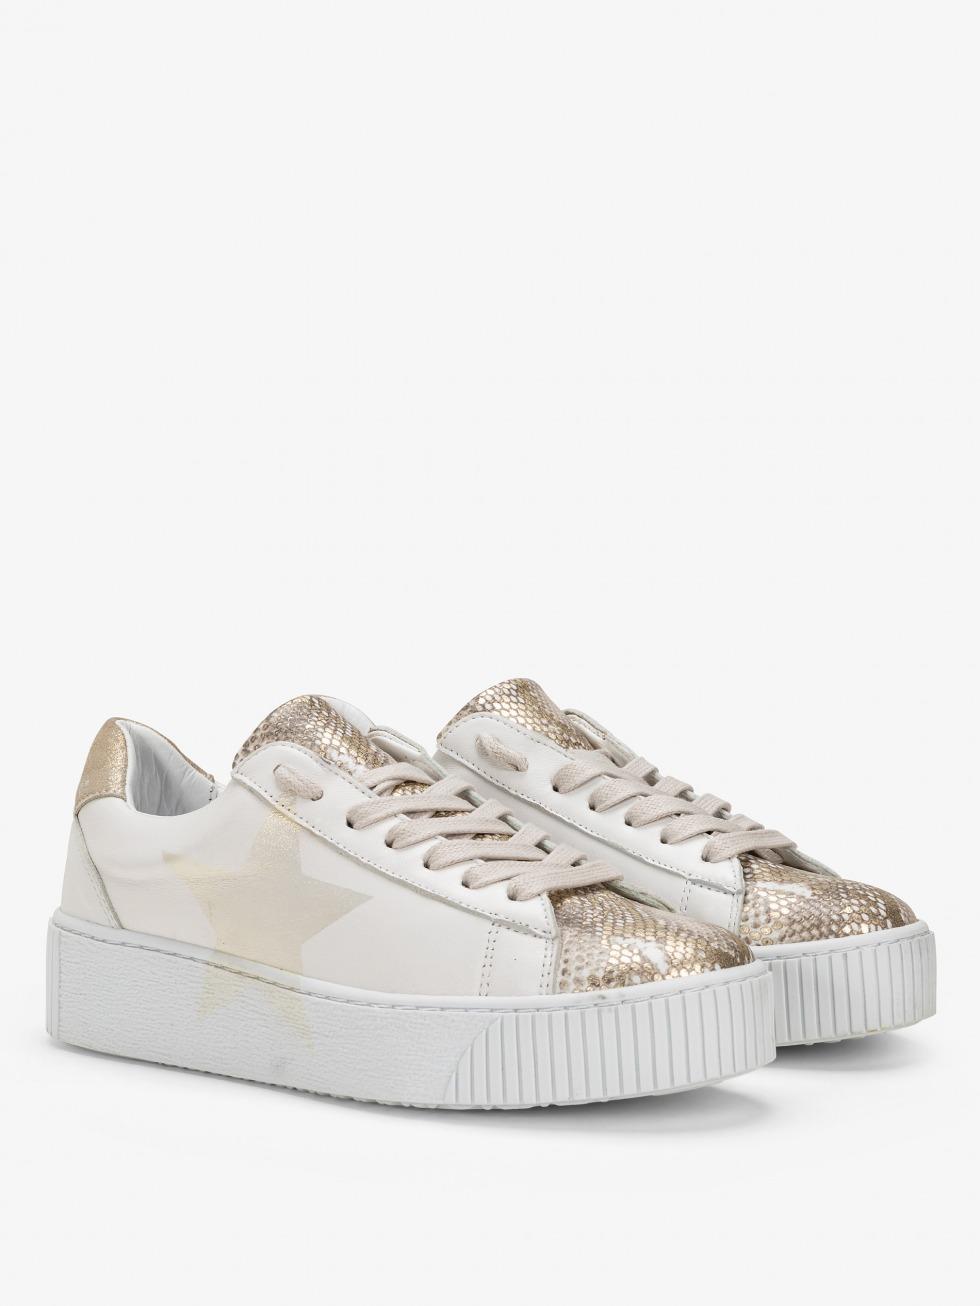 sneakers-bianche-da-donna-cosmopolitan-stella-phyton-gold